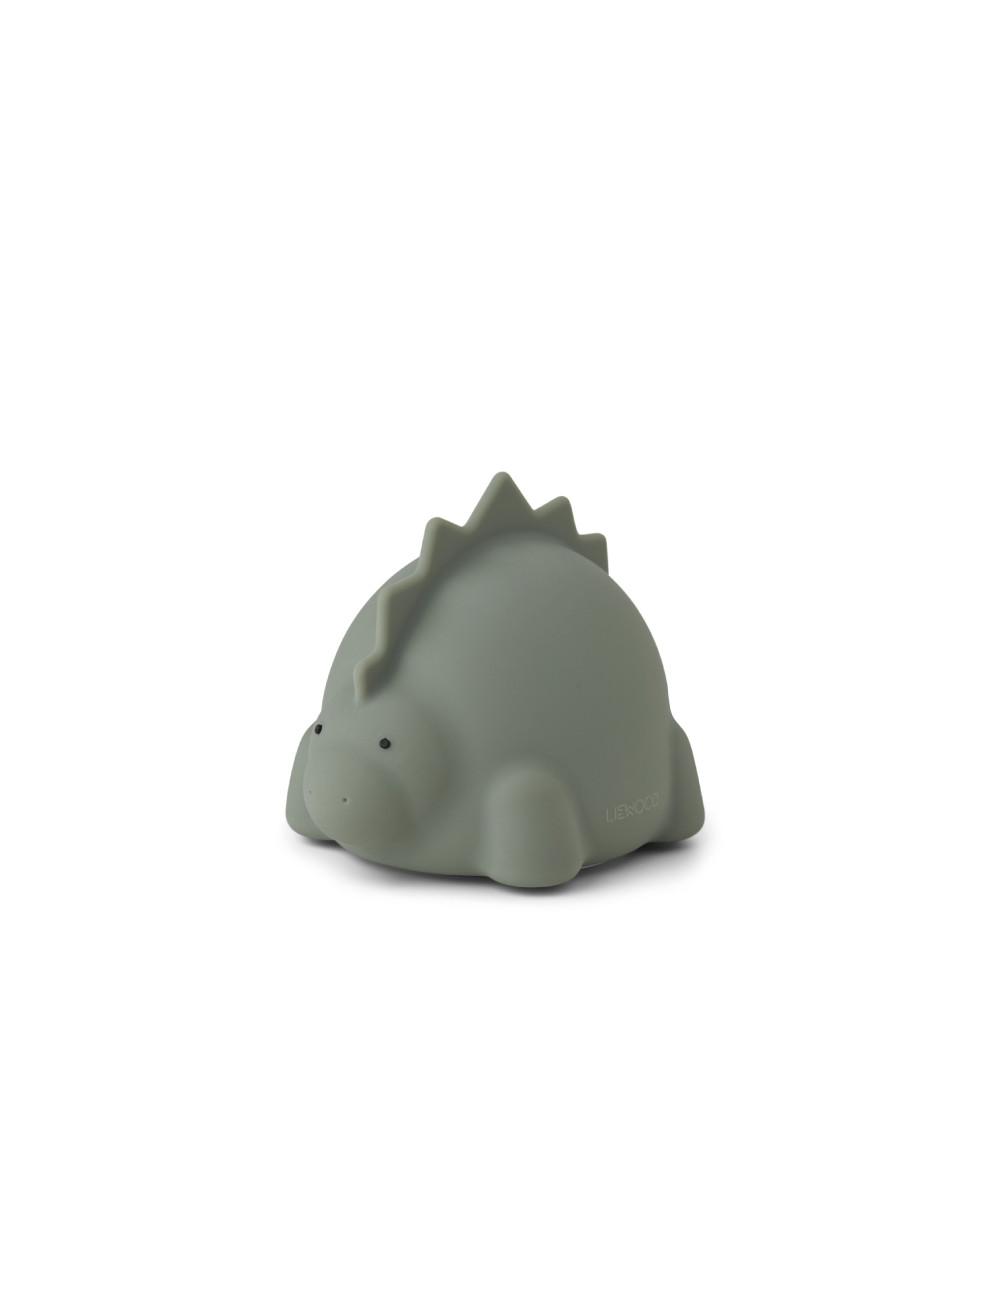 Nachtlampje Winston (oplaadbaar USB) | dino faune green